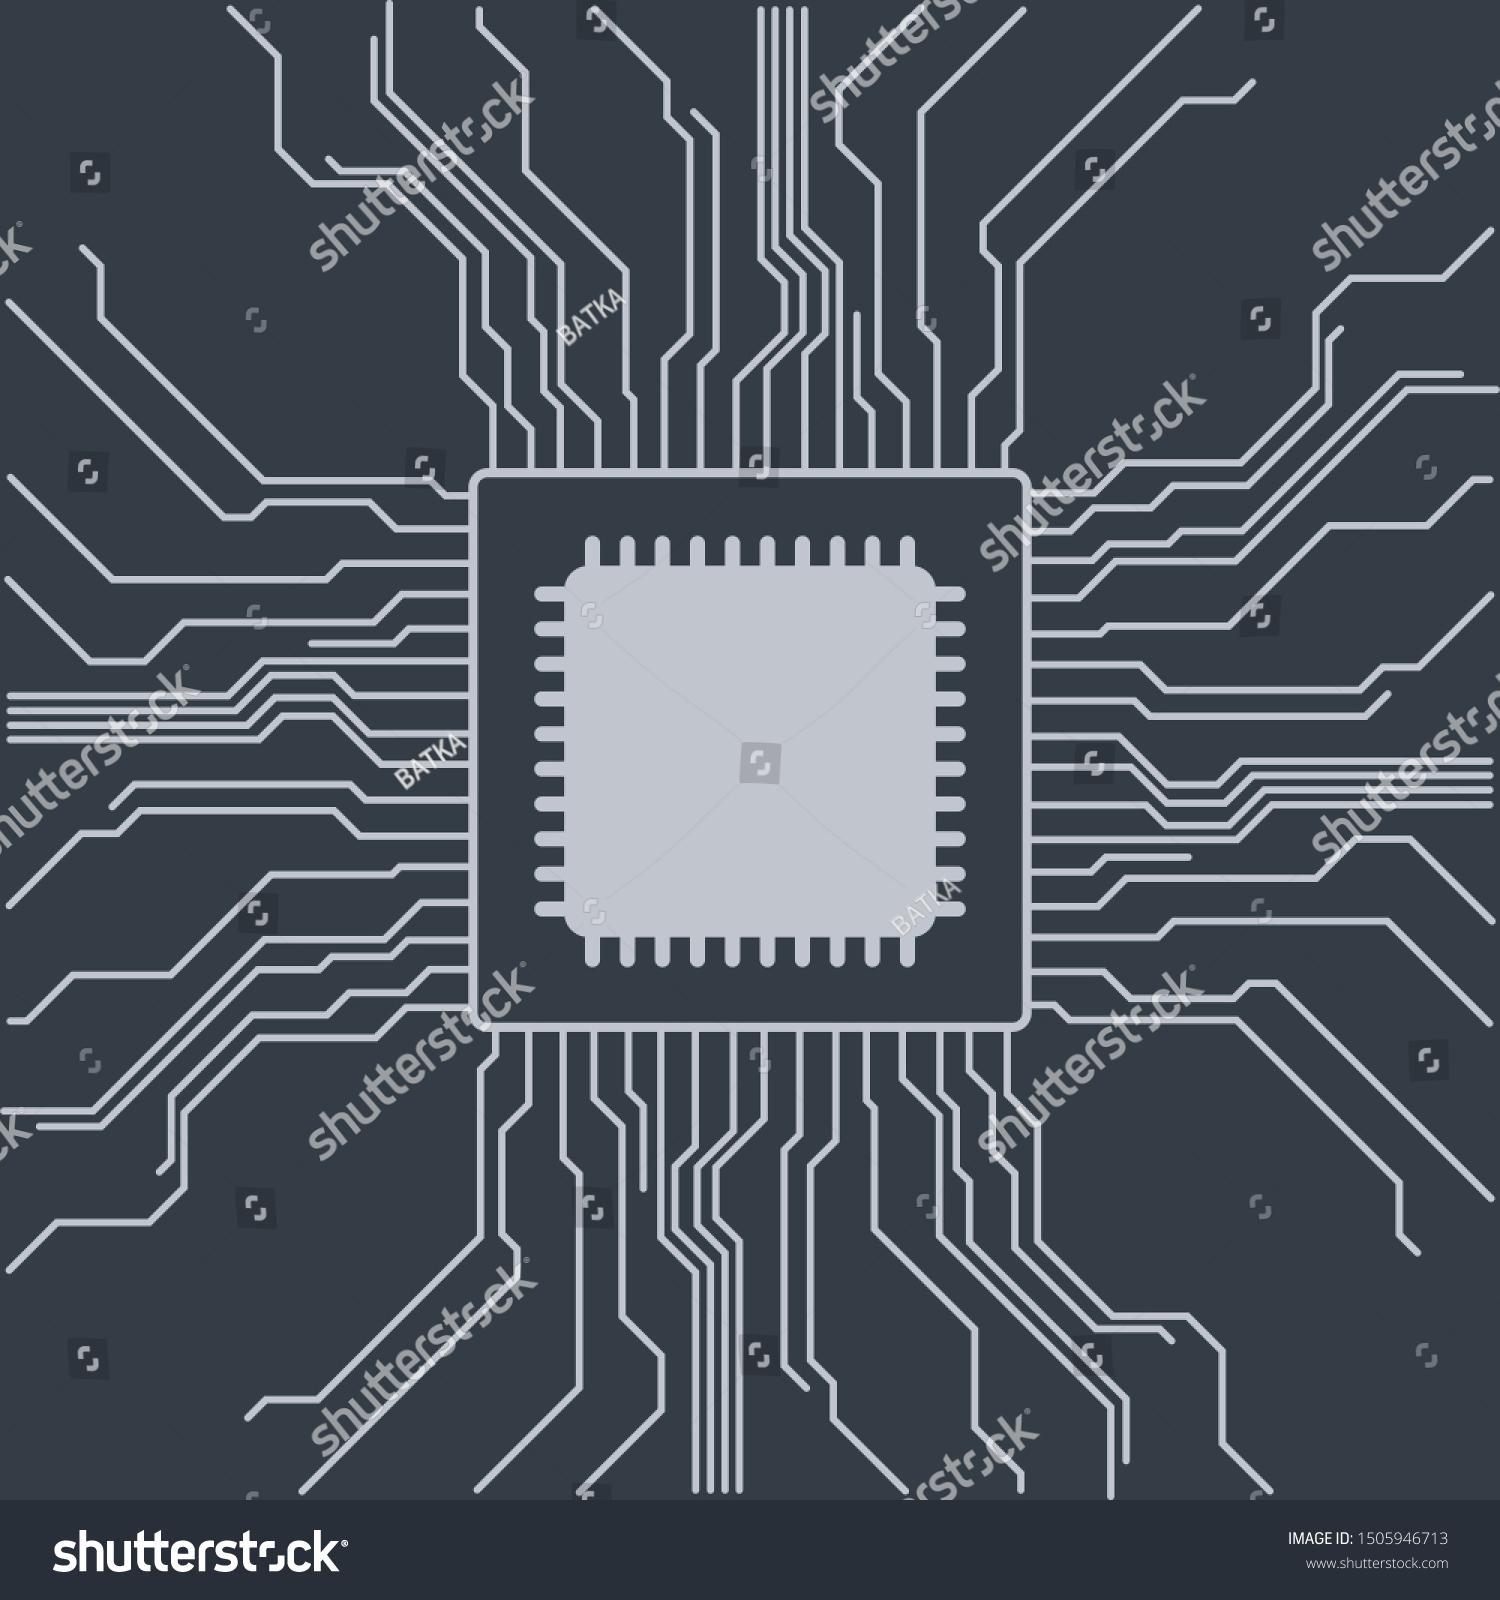 Computer Motherboard Vector Background Circuit Board Stock Vector (Royalty  Free) 1505946713Shutterstock